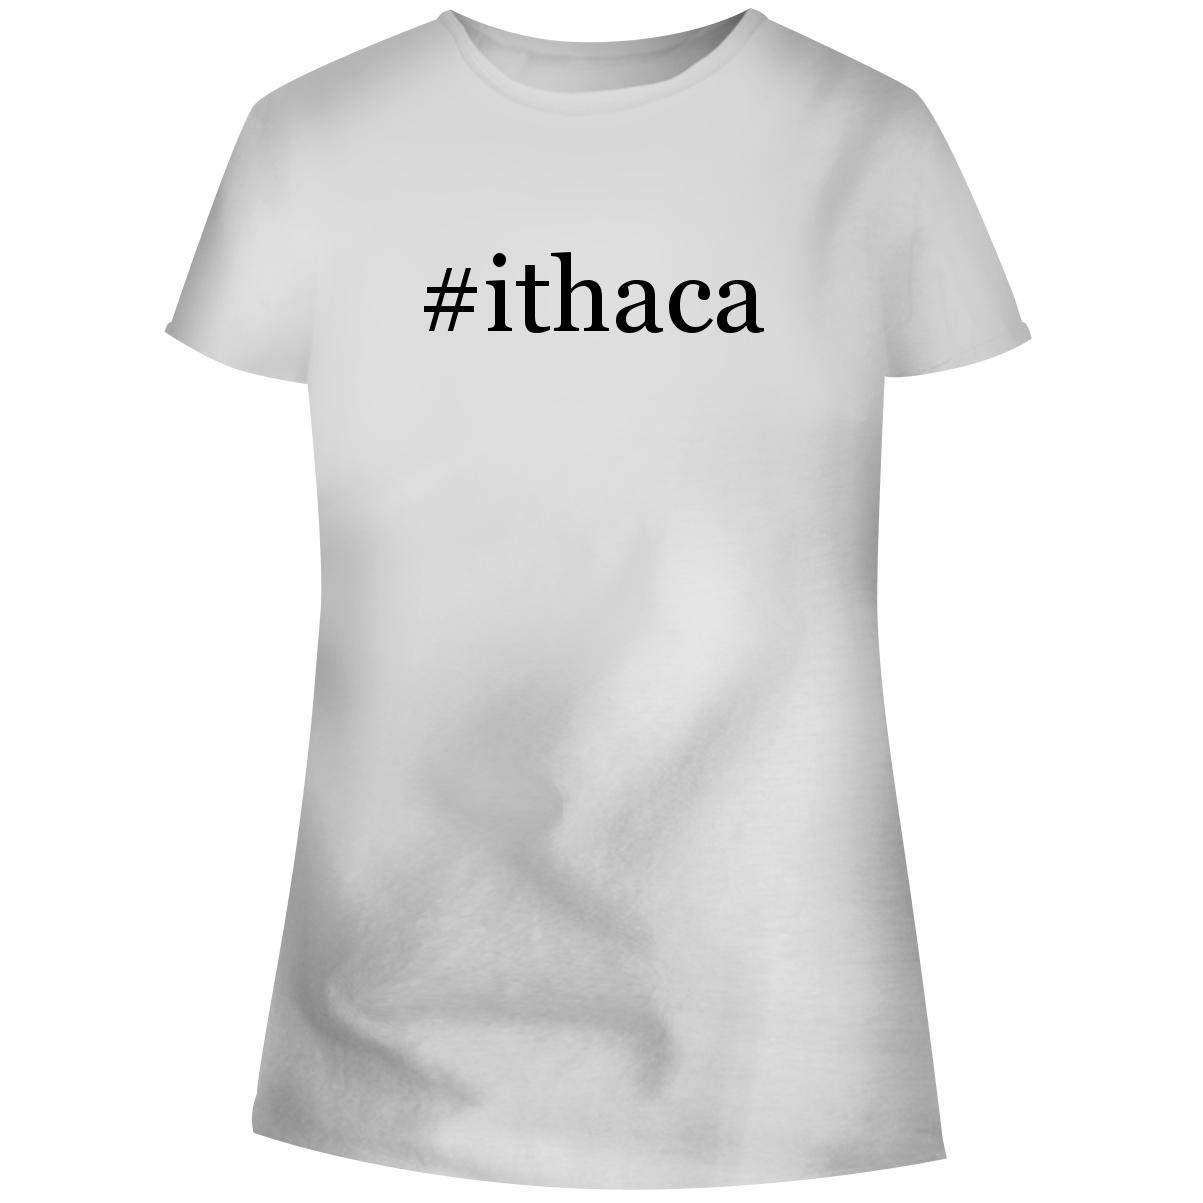 Ithaca Hashtag Soft Cut Adult Tee T Shirt 3229